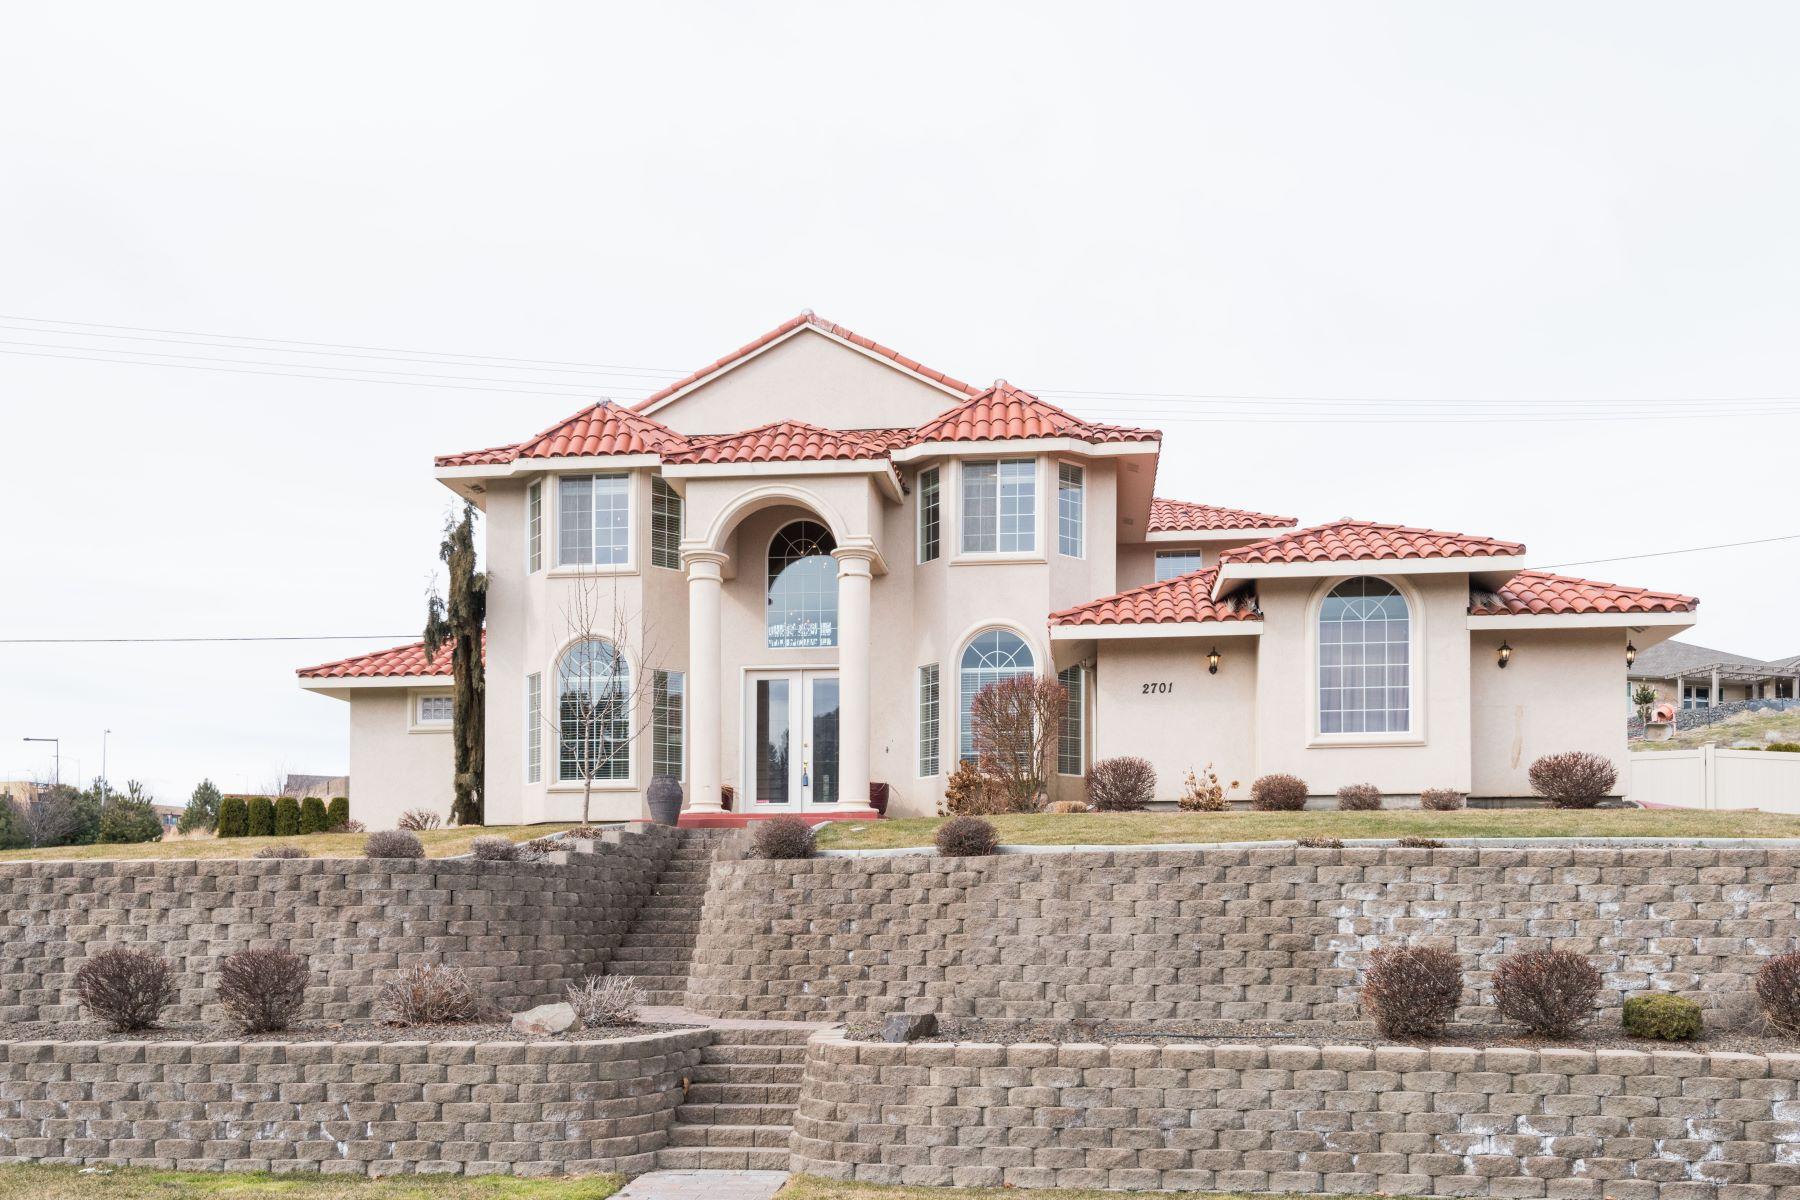 Casa Unifamiliar por un Venta en Elegant Home with RV Parking 2701 W. Canyon Lakes Dr Kennewick, Washington 99337 Estados Unidos